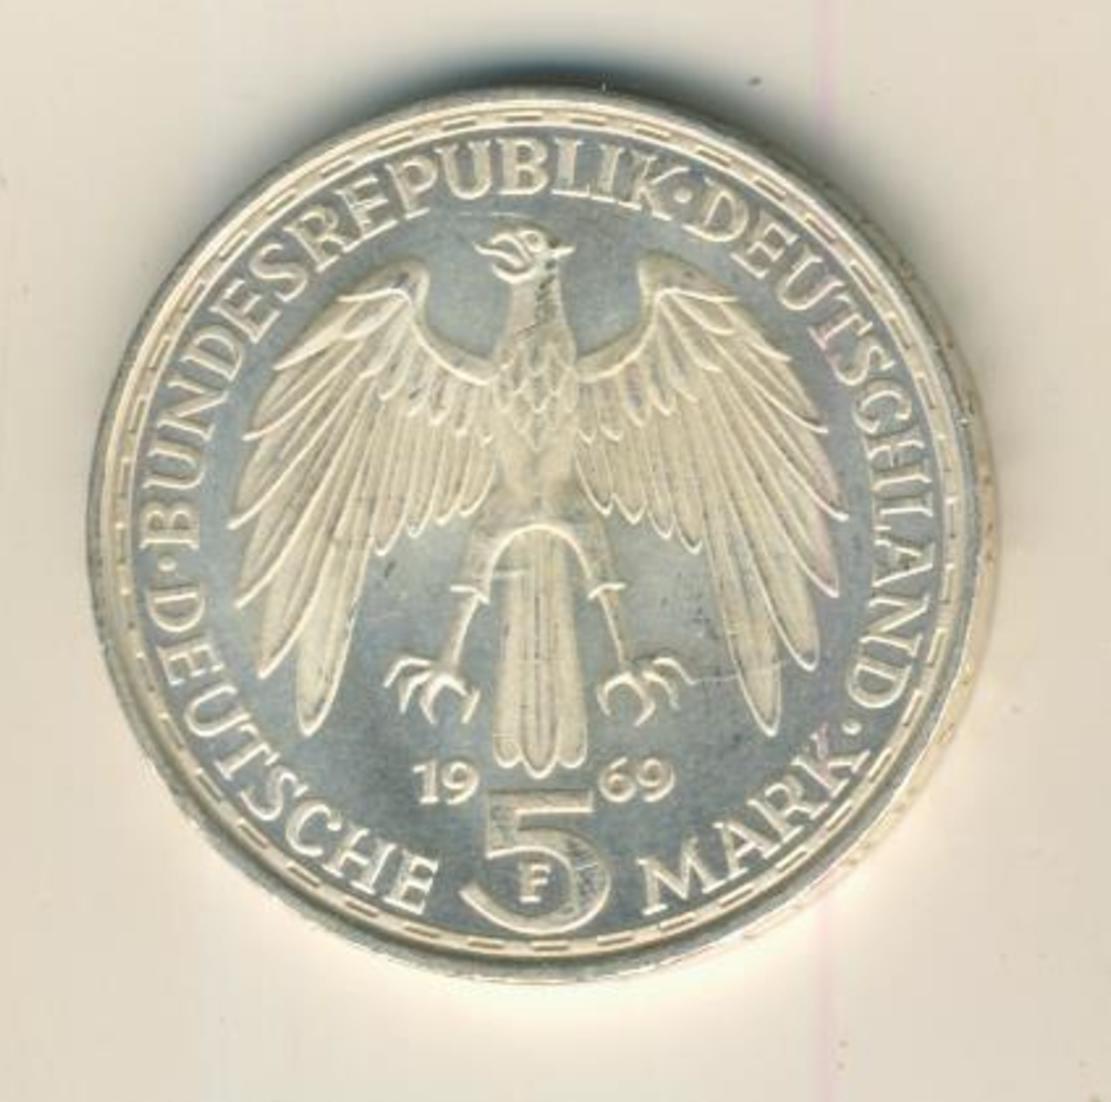 5 Mark DM 1969 F Gerhard Mercator, Silber   (13) 1